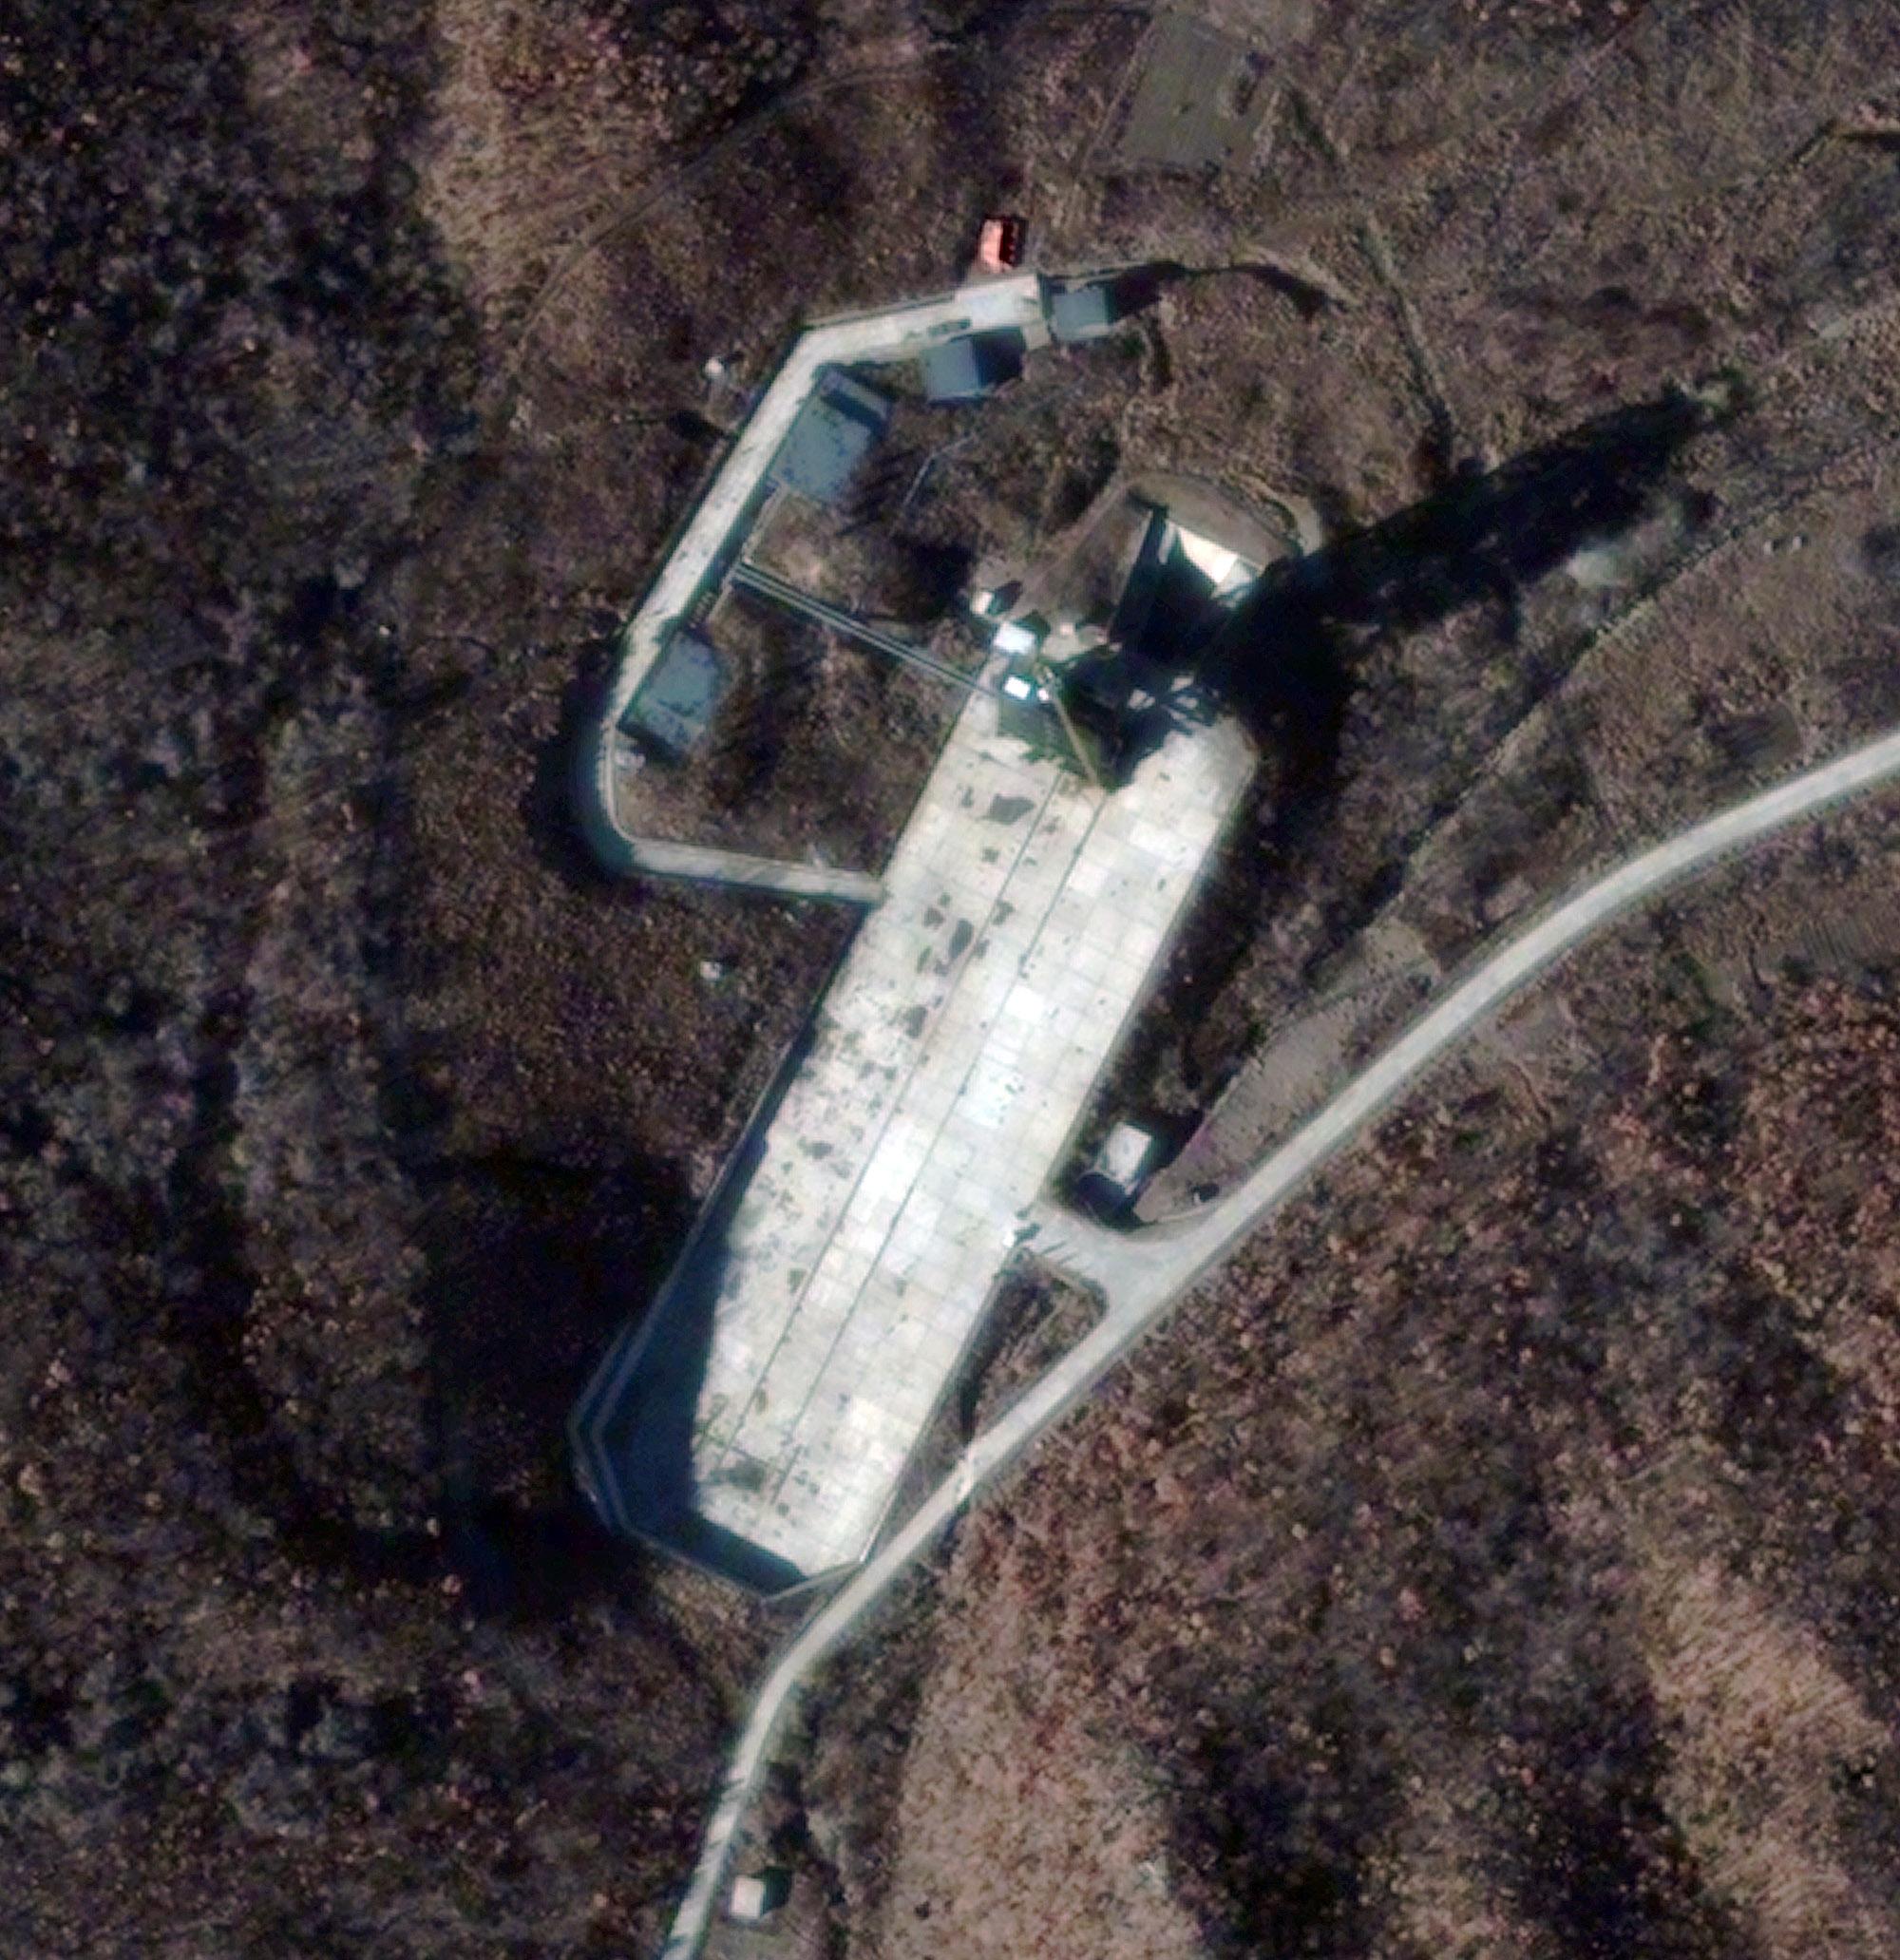 North Korea's New Rocket Engine Could Loft Satellites —Or Missiles